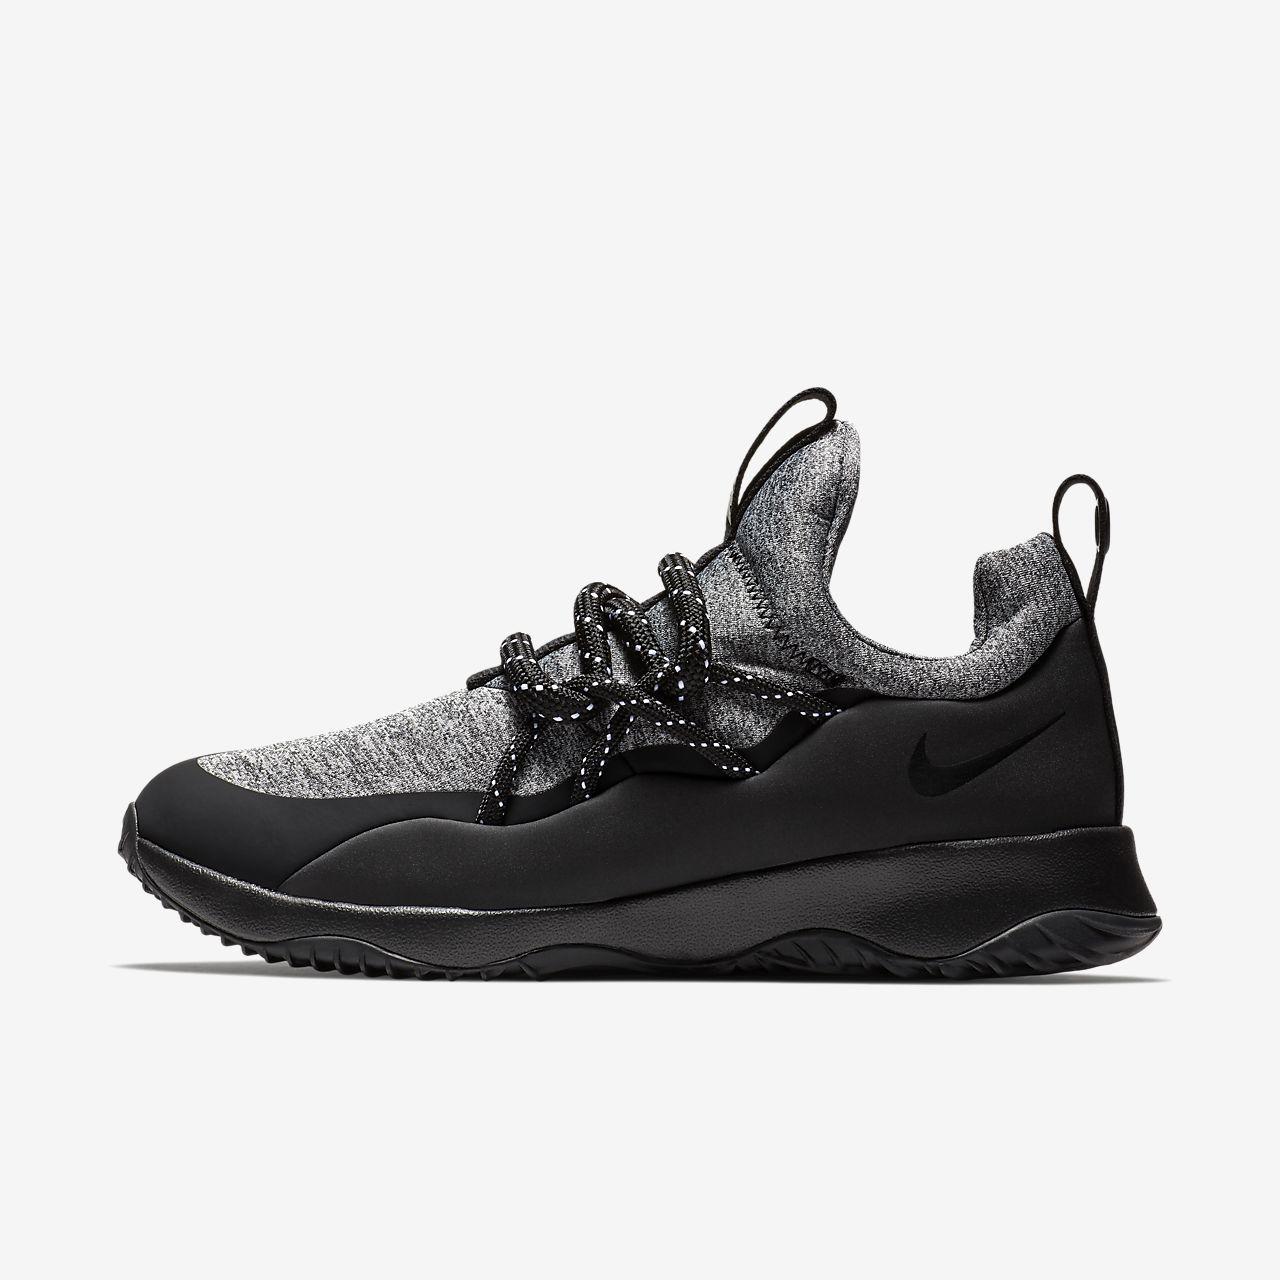 ... Nike City Loop Women's Shoe